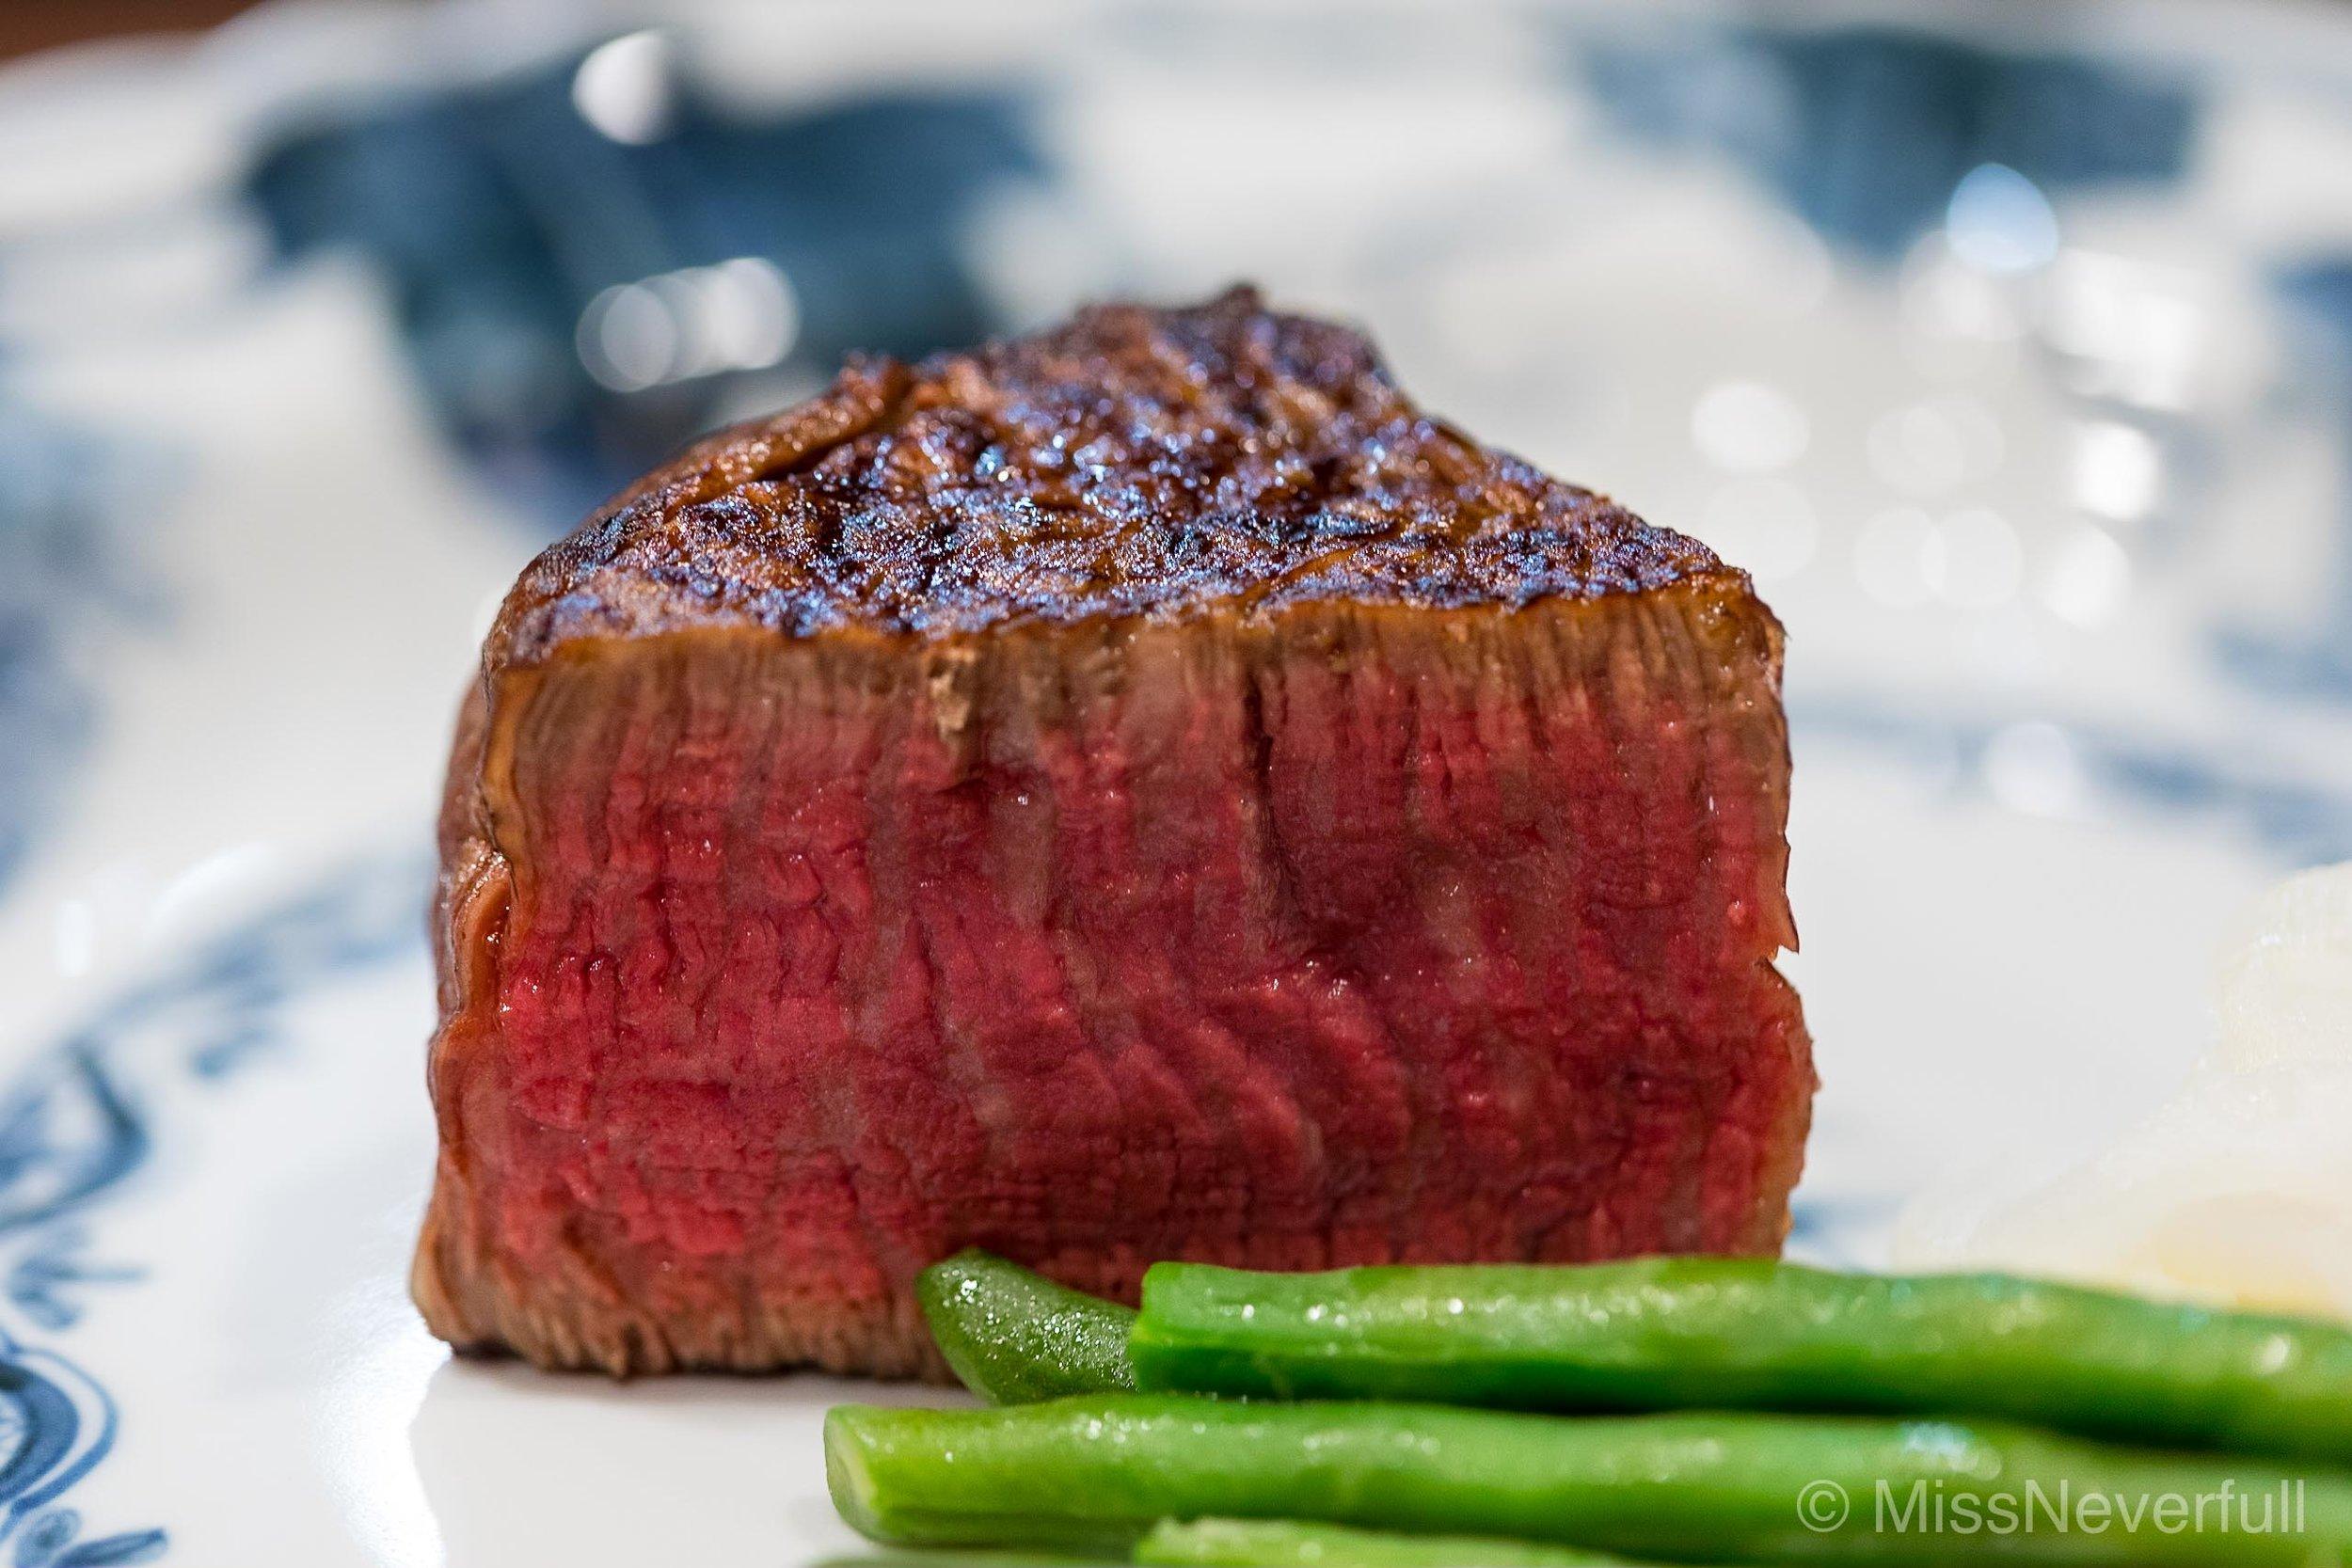 5. Roasted wagyu steak